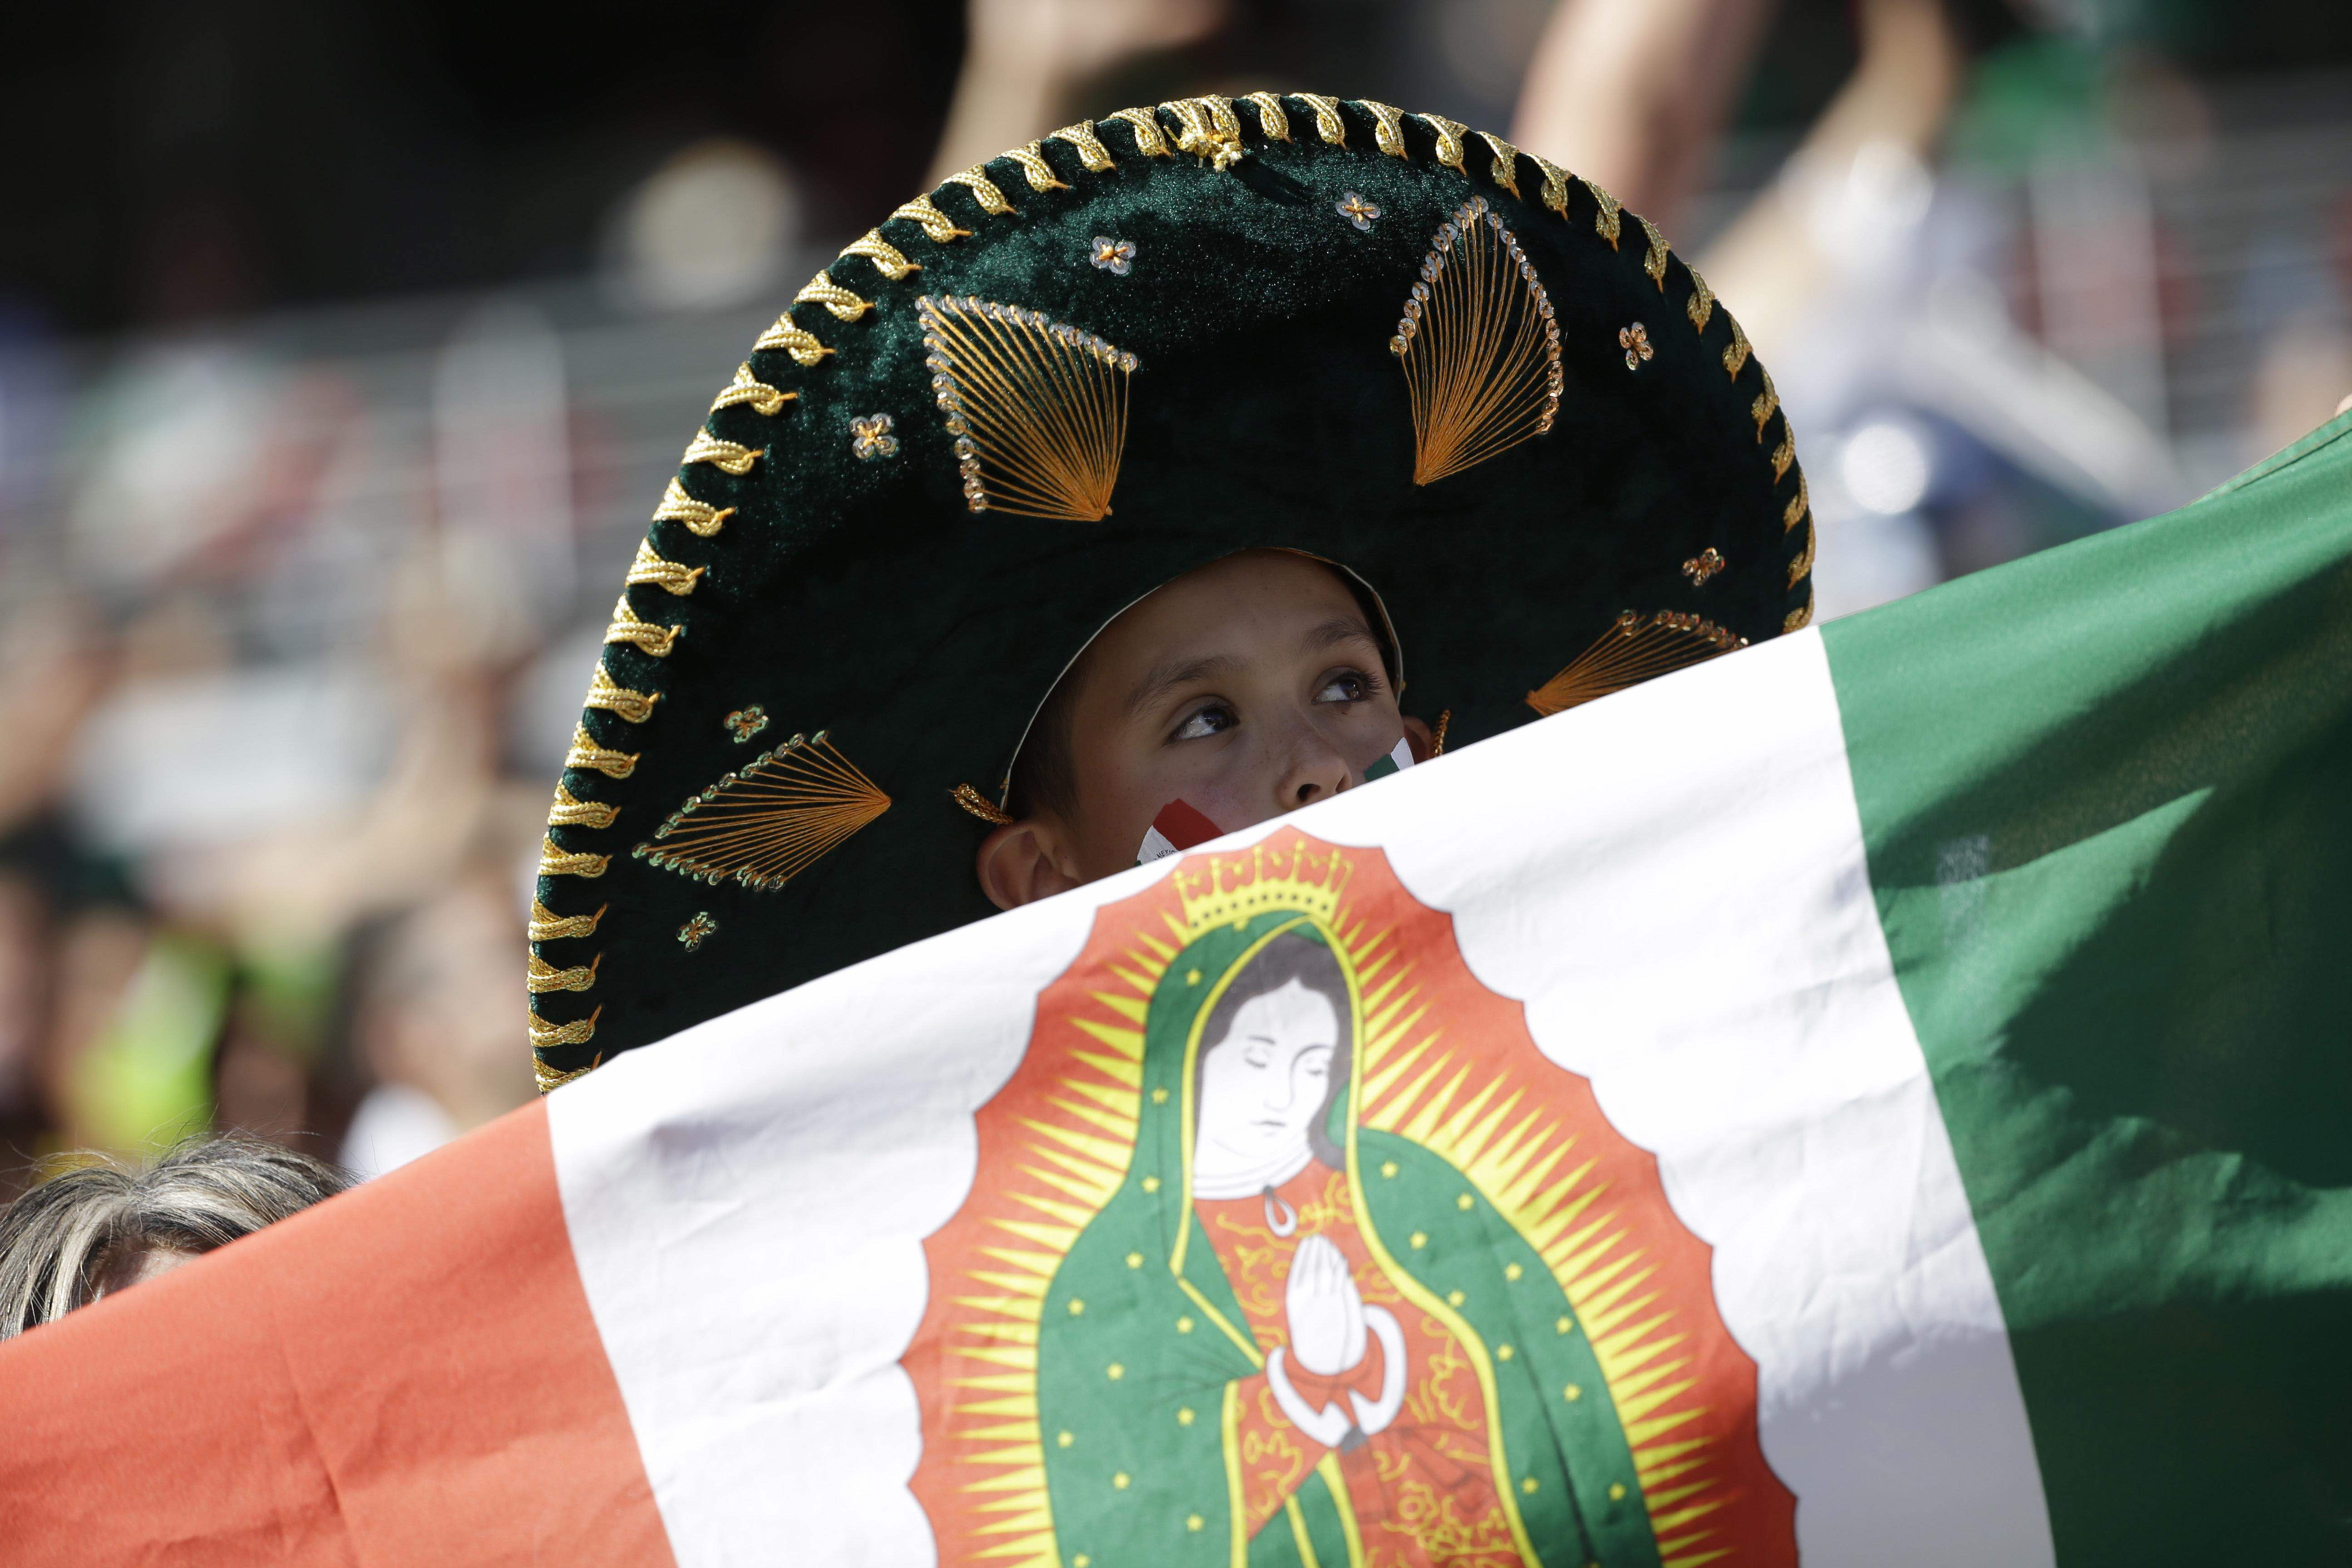 bandera-mexico-virgen-guadalupe